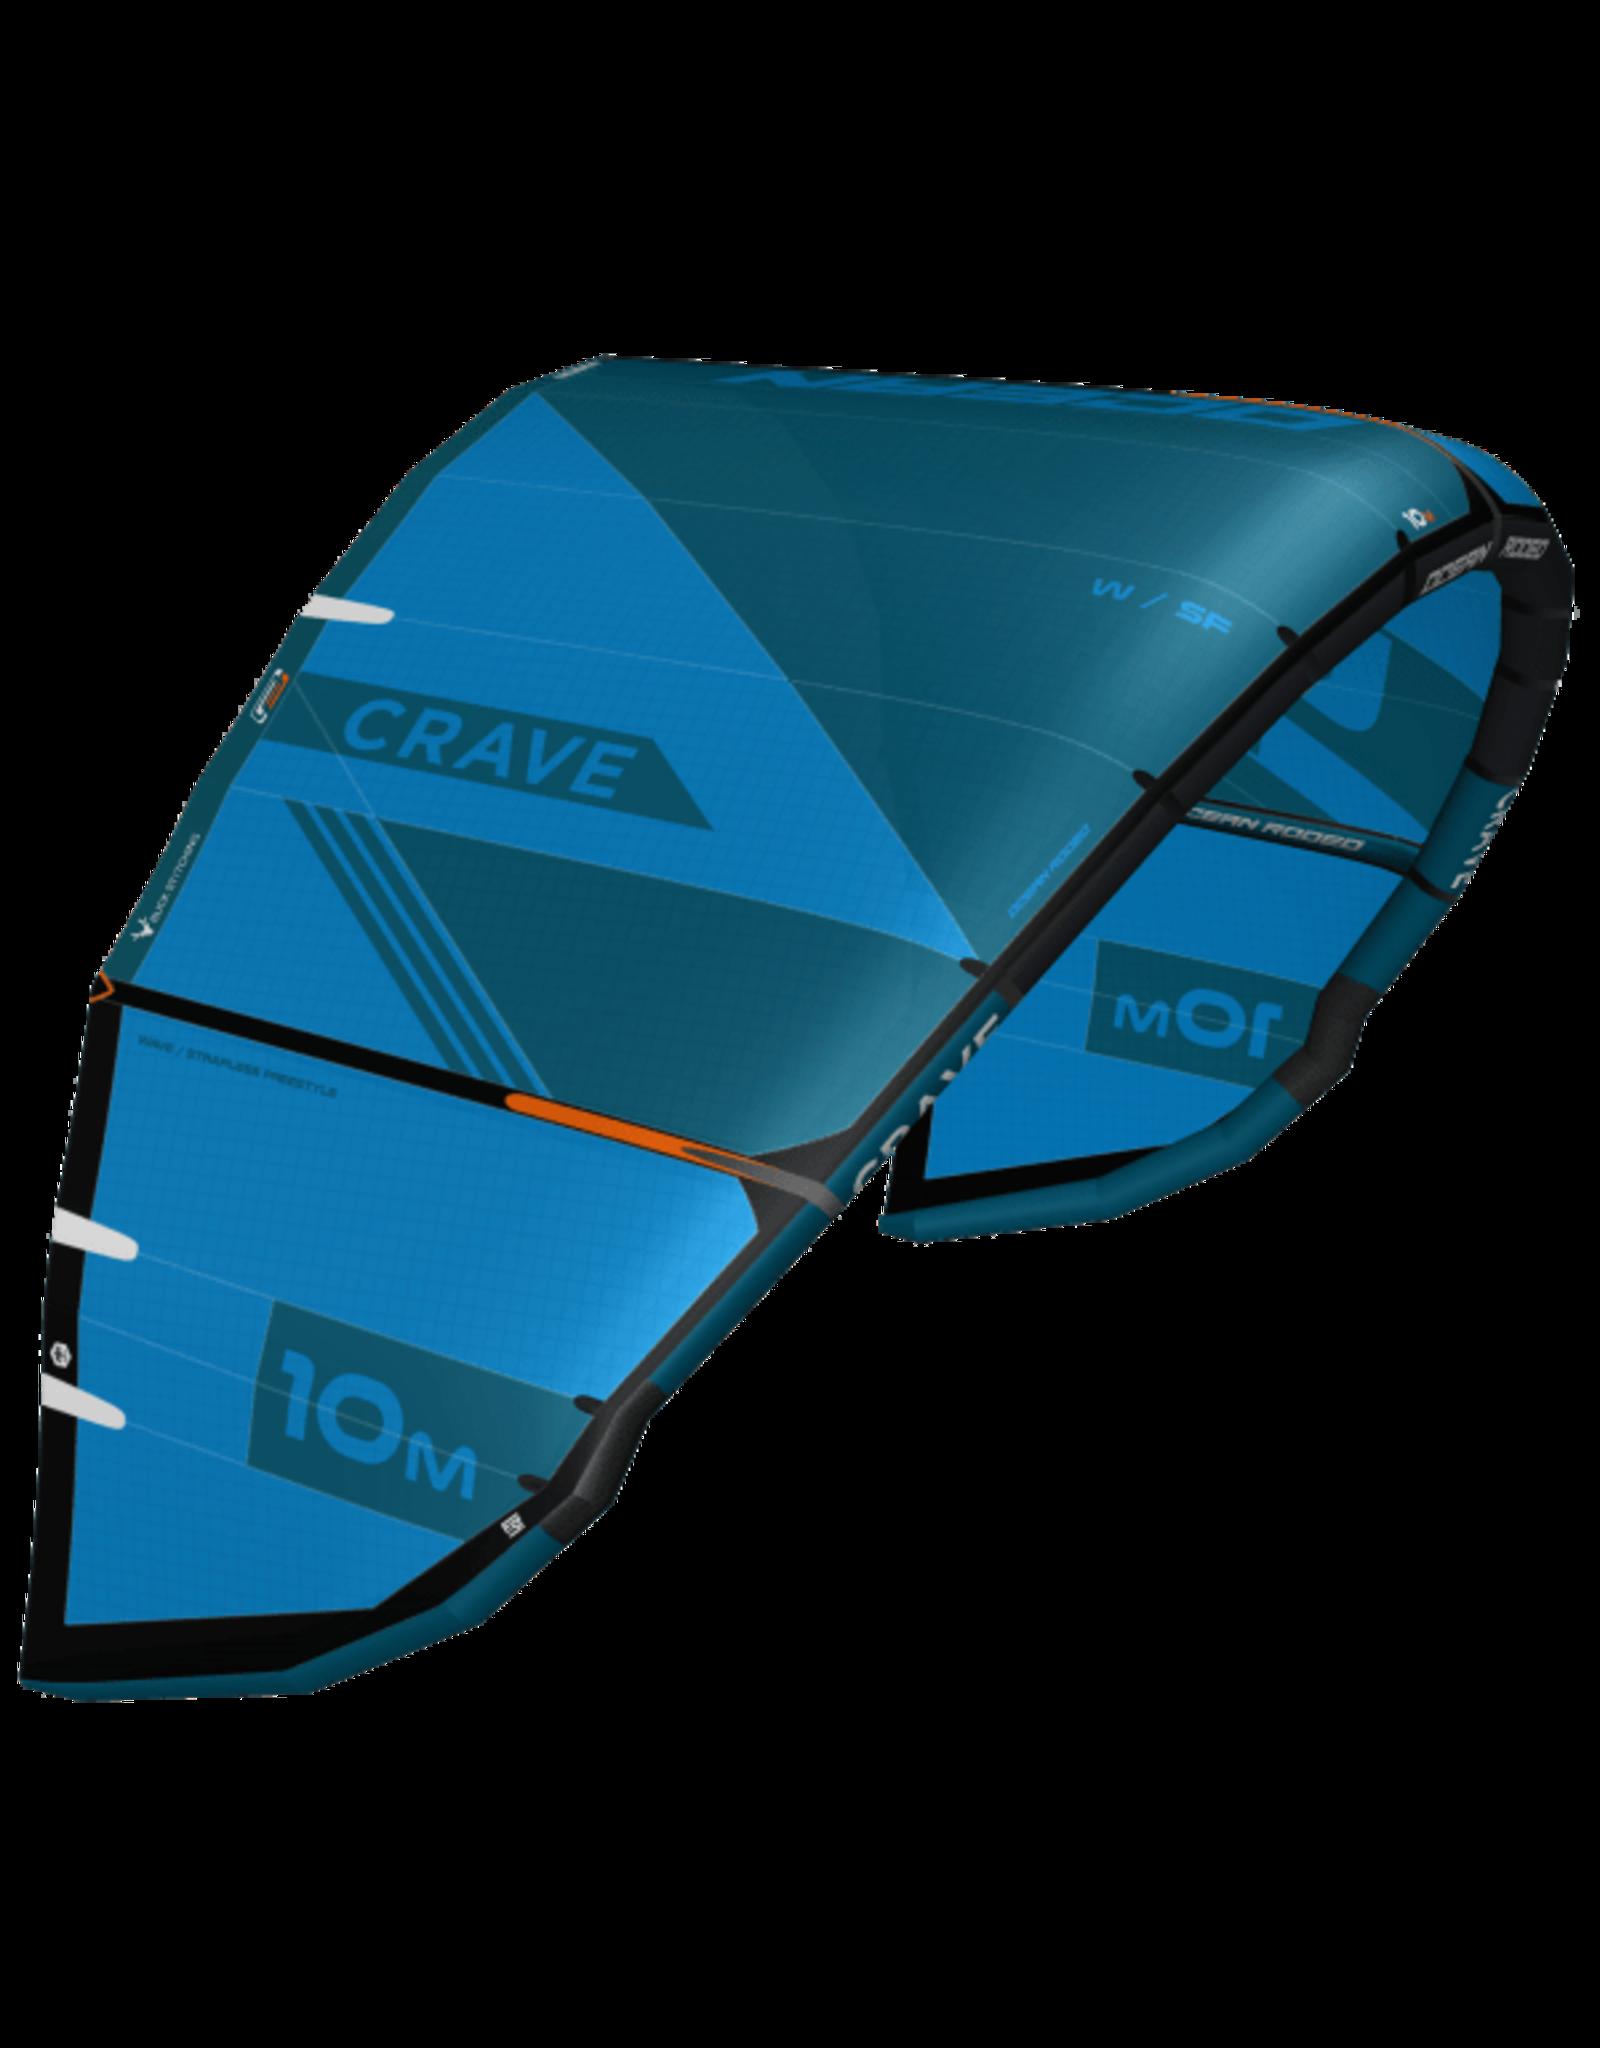 Ocean Rodeo Crave 2020 Blue